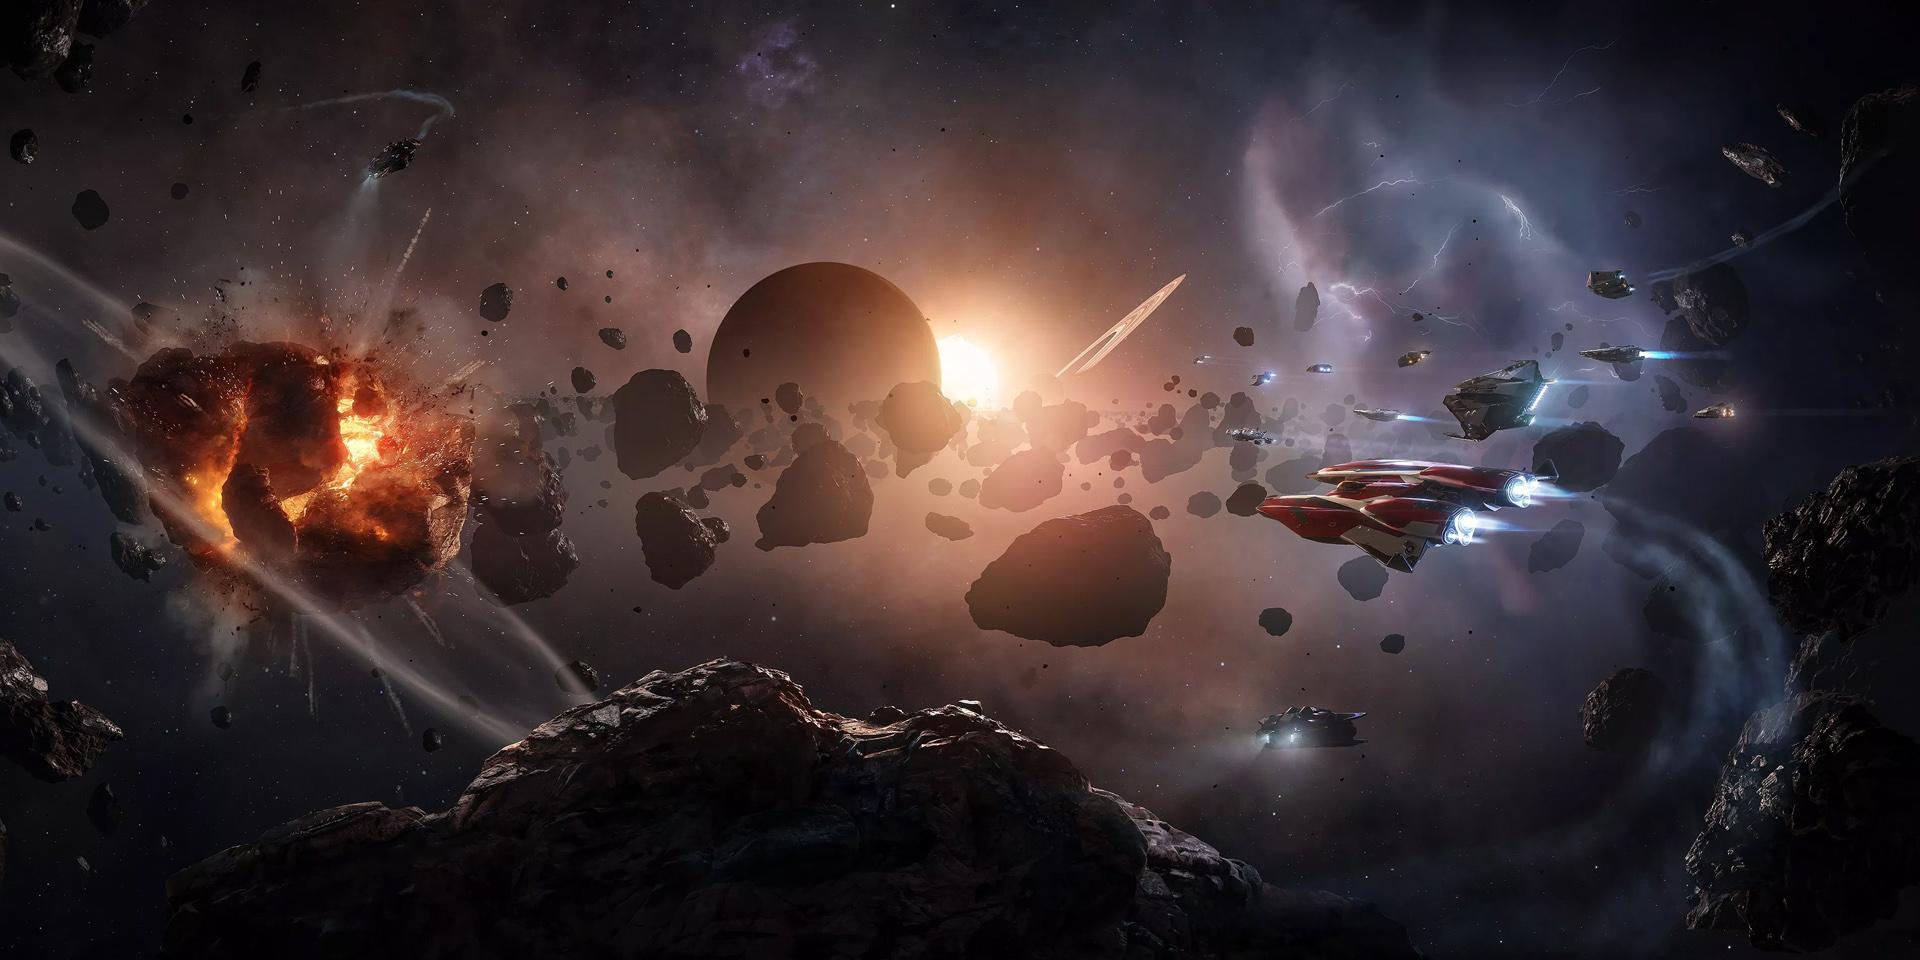 Elite: Dangerous: На поиски богатств: космический майнинг моей мечты